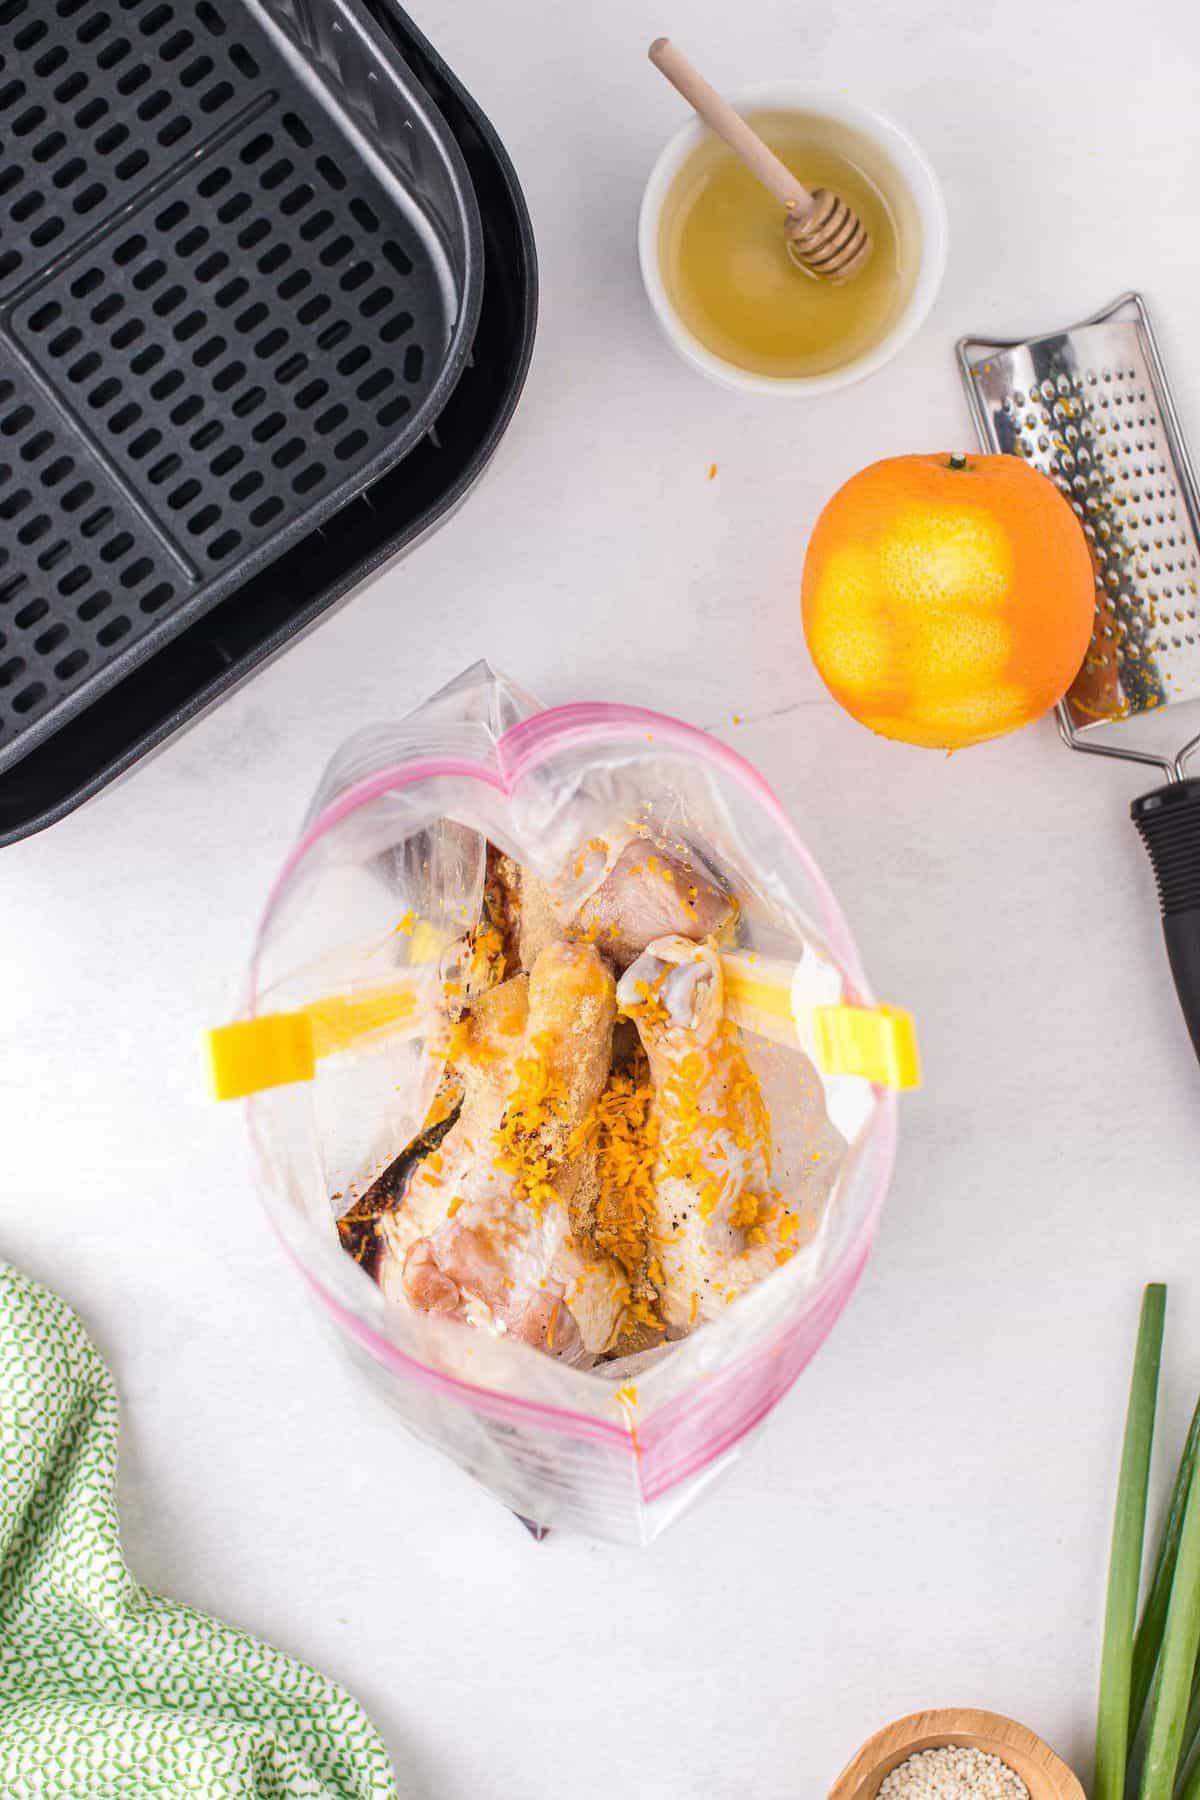 marinate chicken in the large ziploc bag